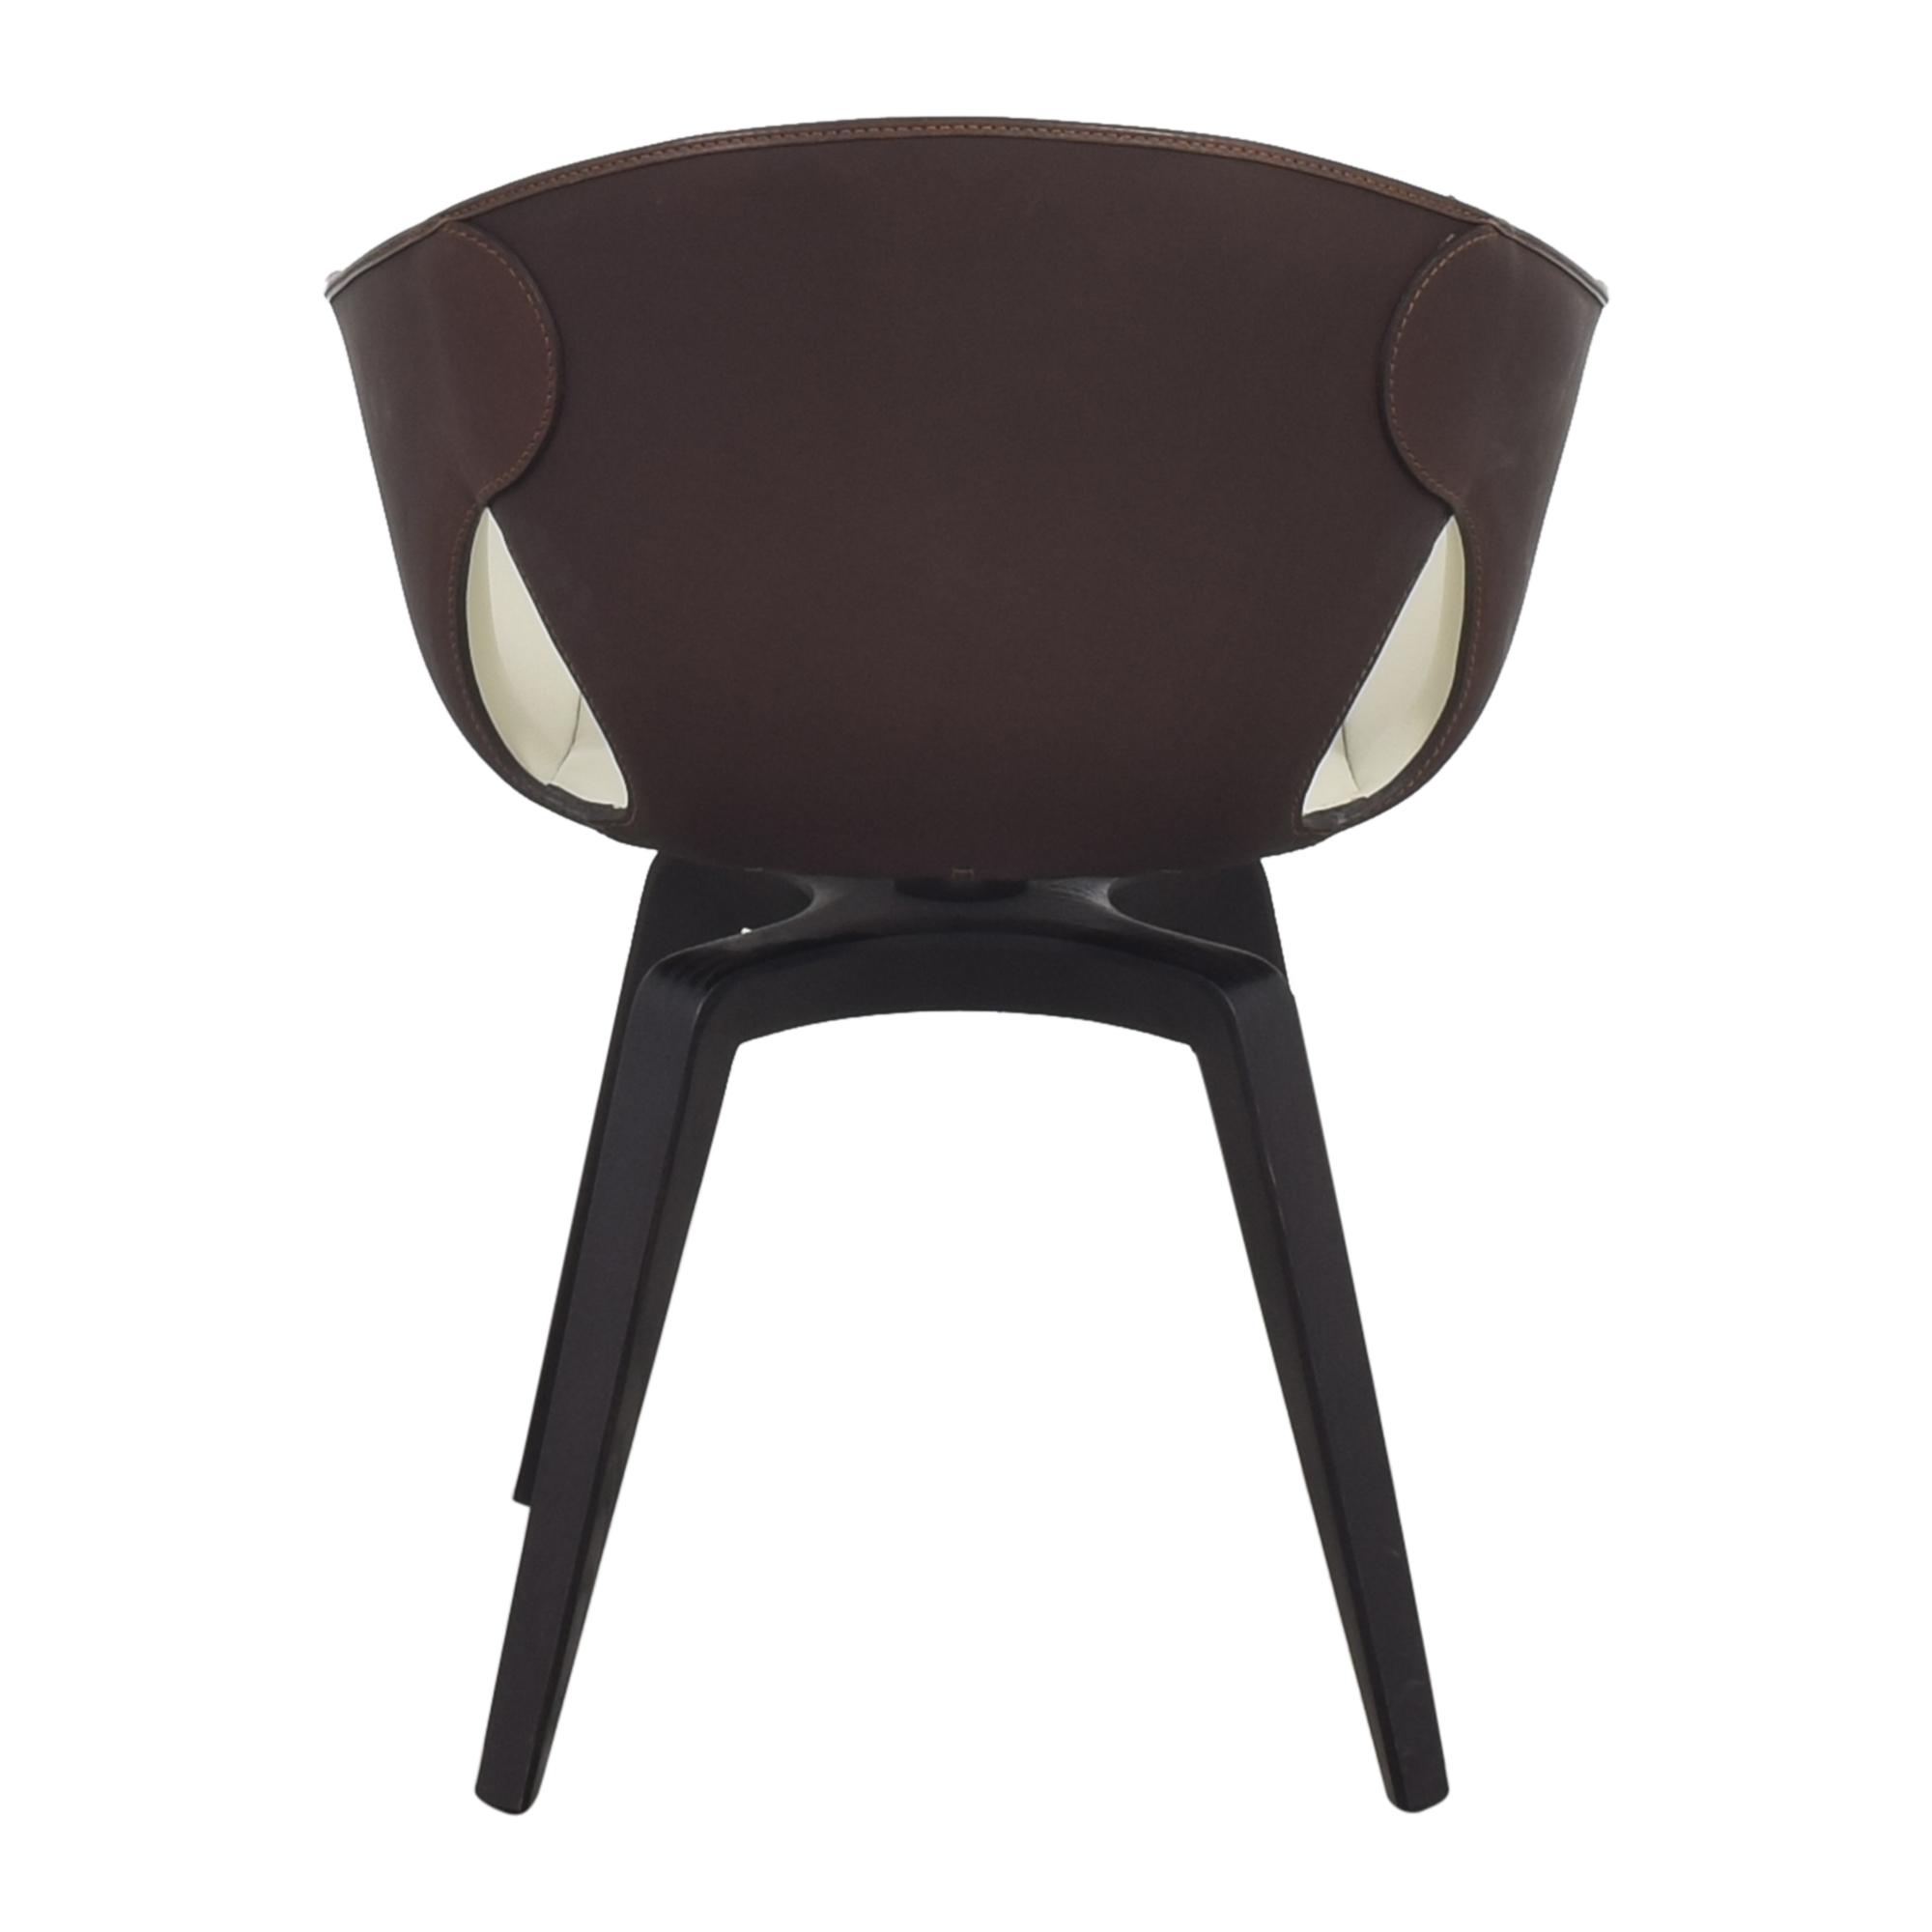 Poltrona Frau Poltrona Frau Ginger Side Chair